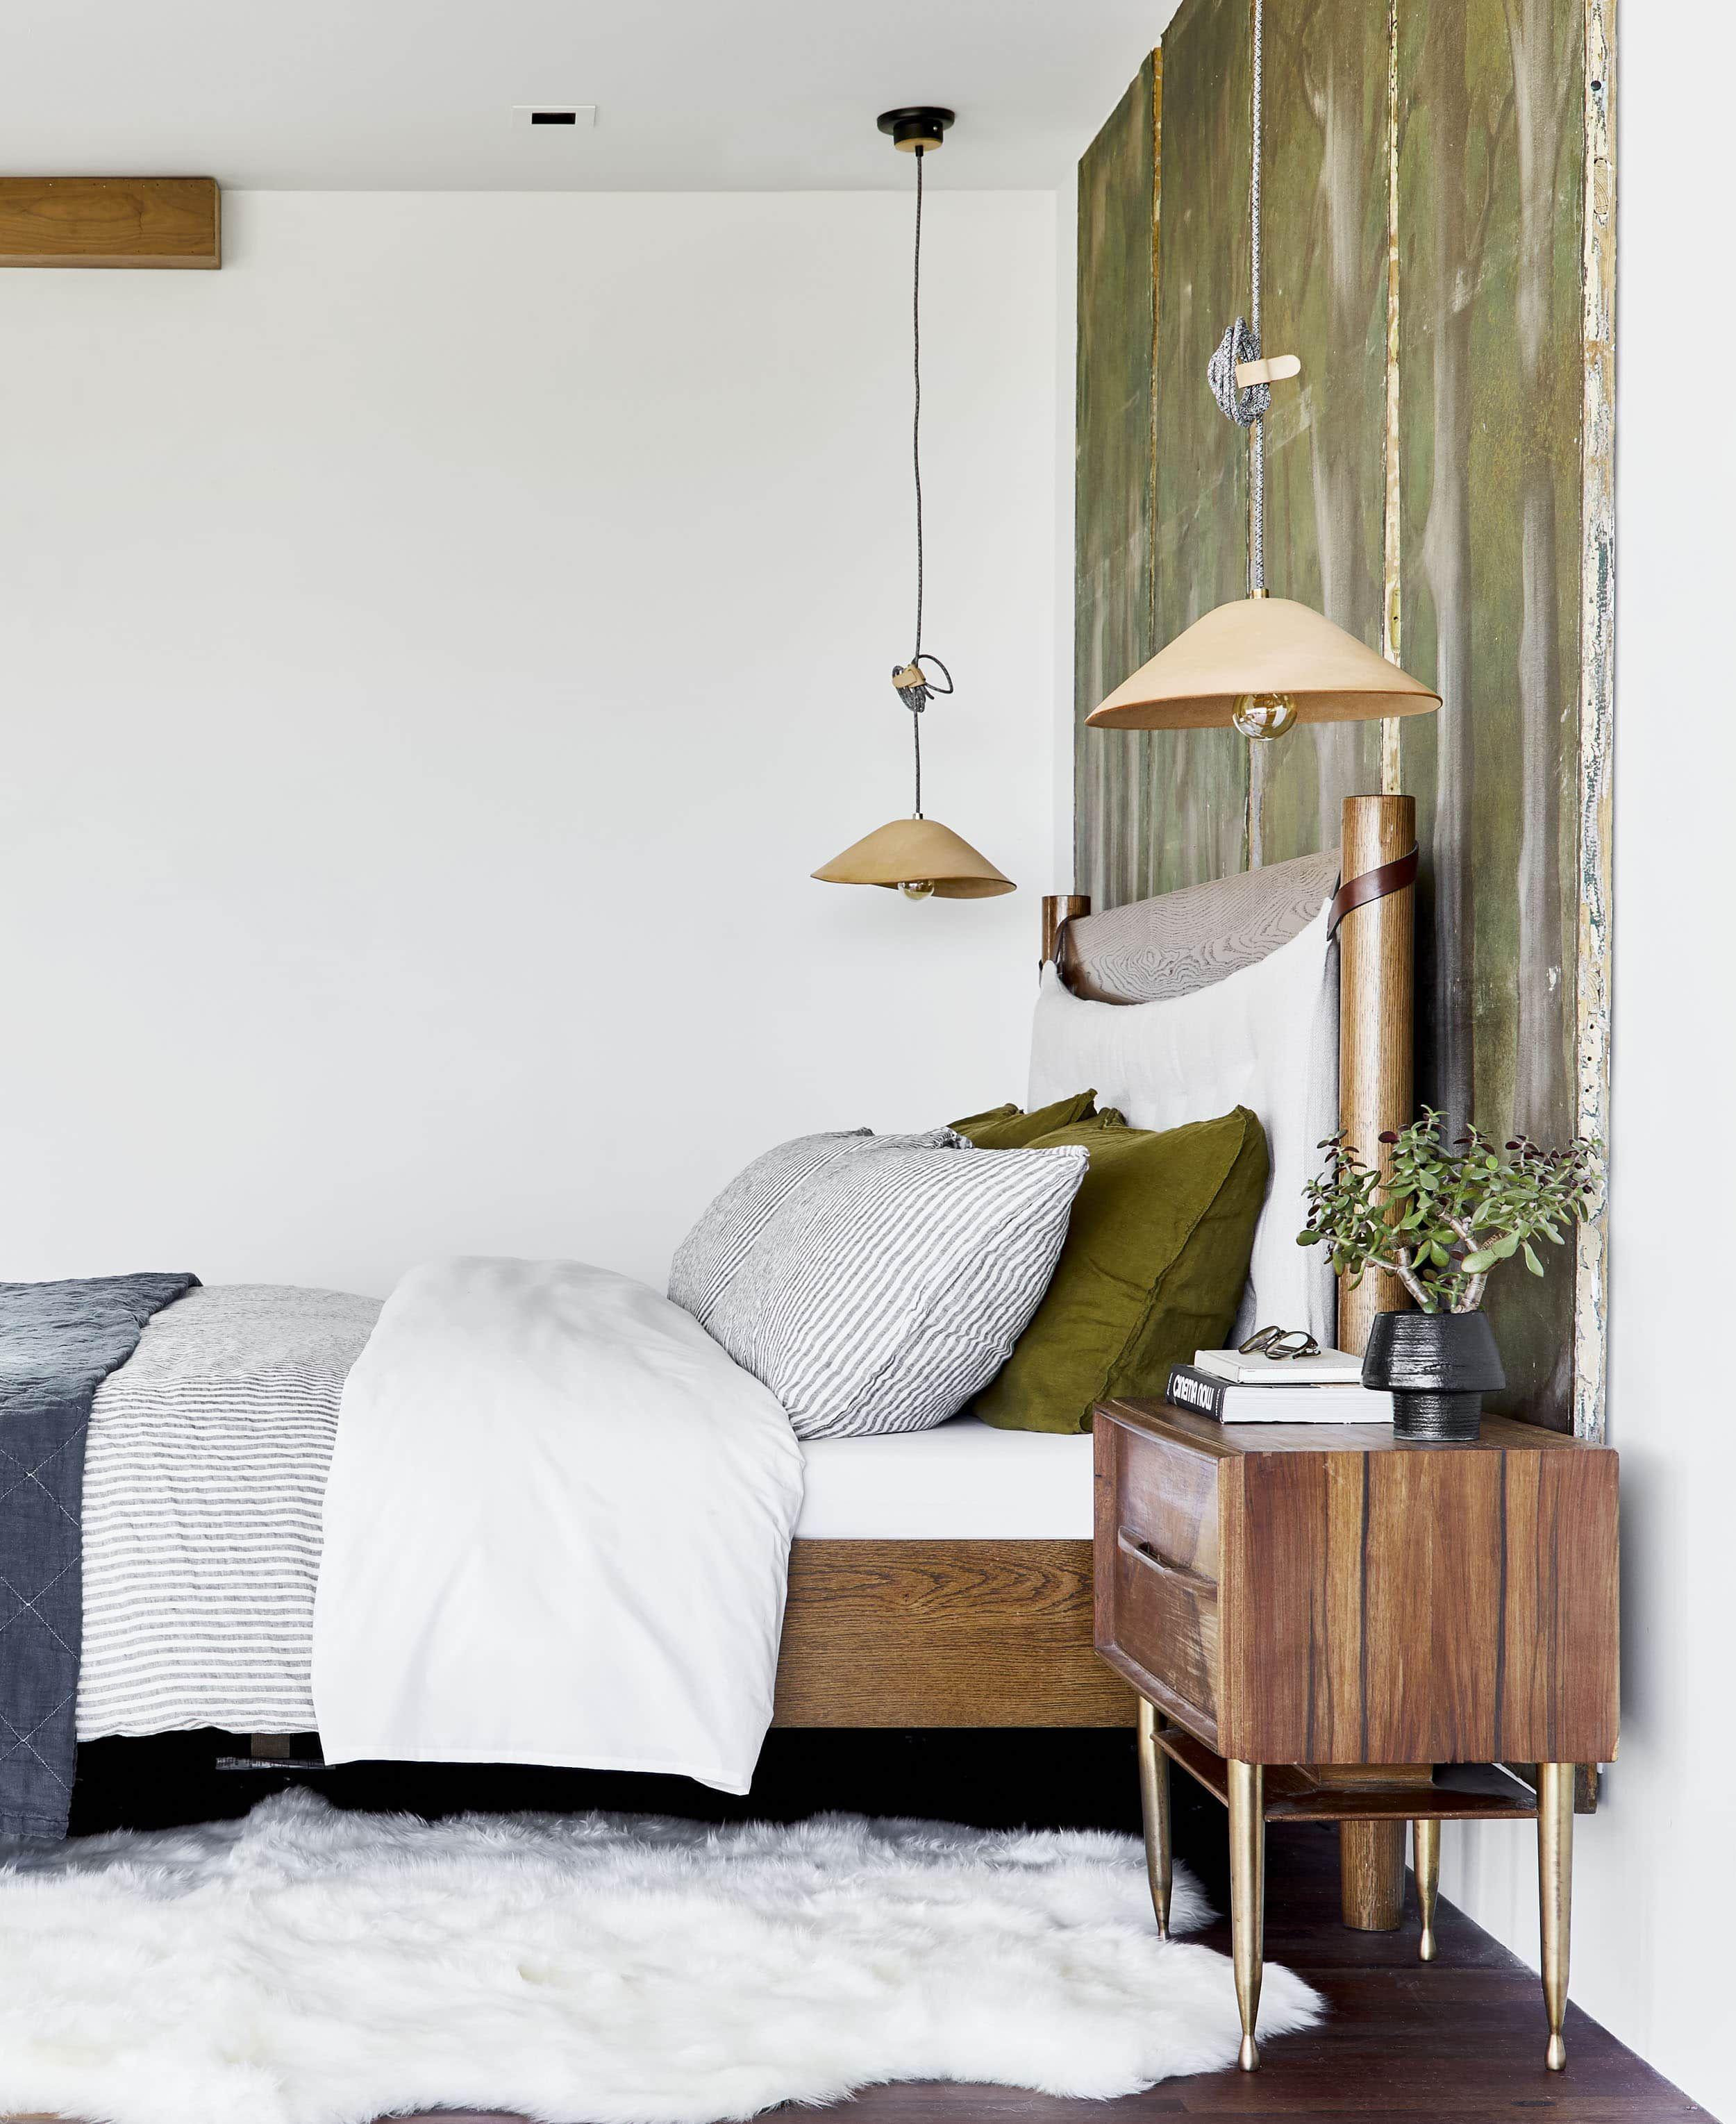 21+ The organic bedroom ideas